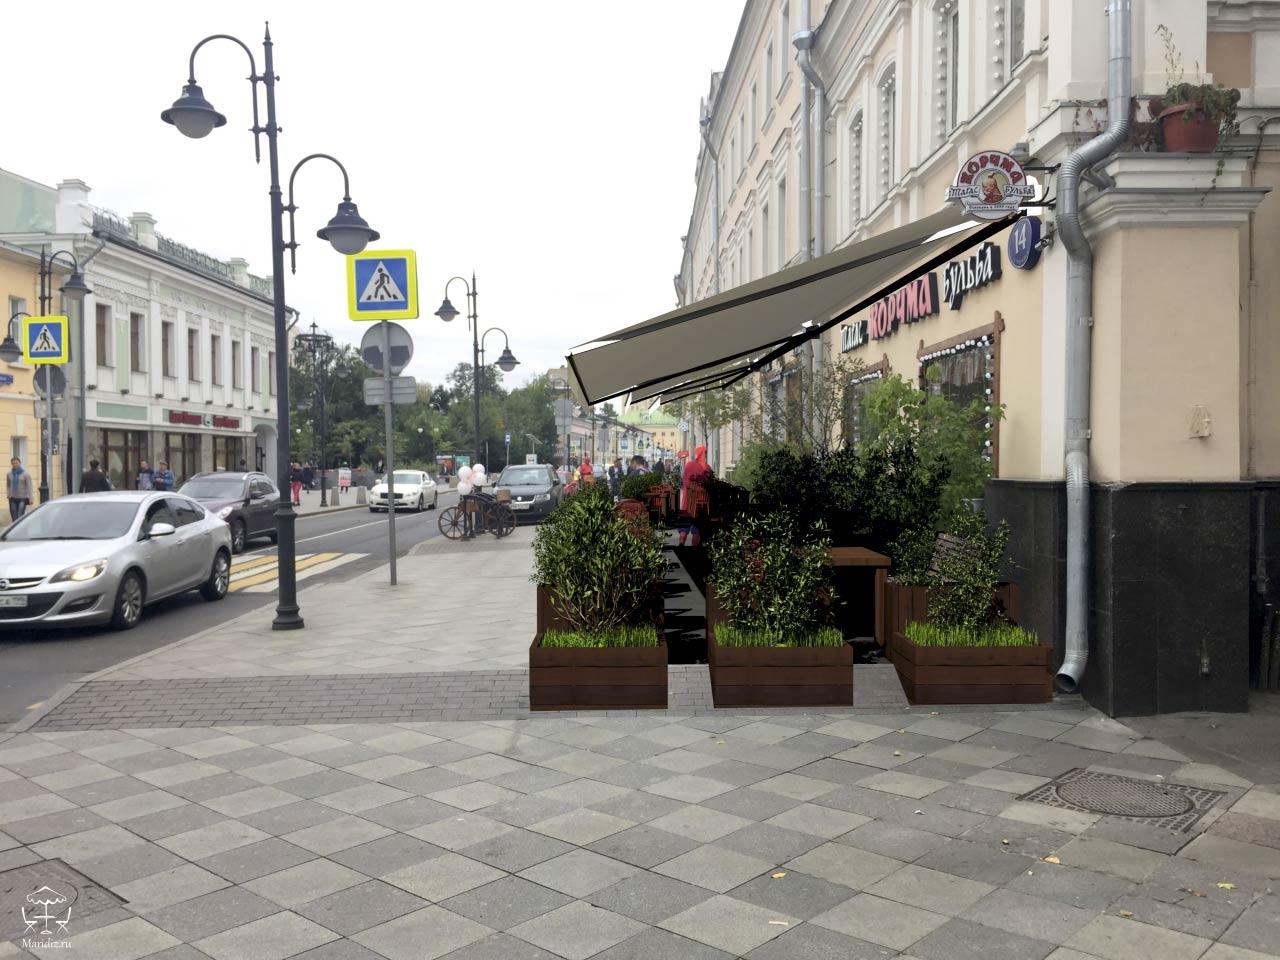 restoran-kochma-taras-bulba-posle